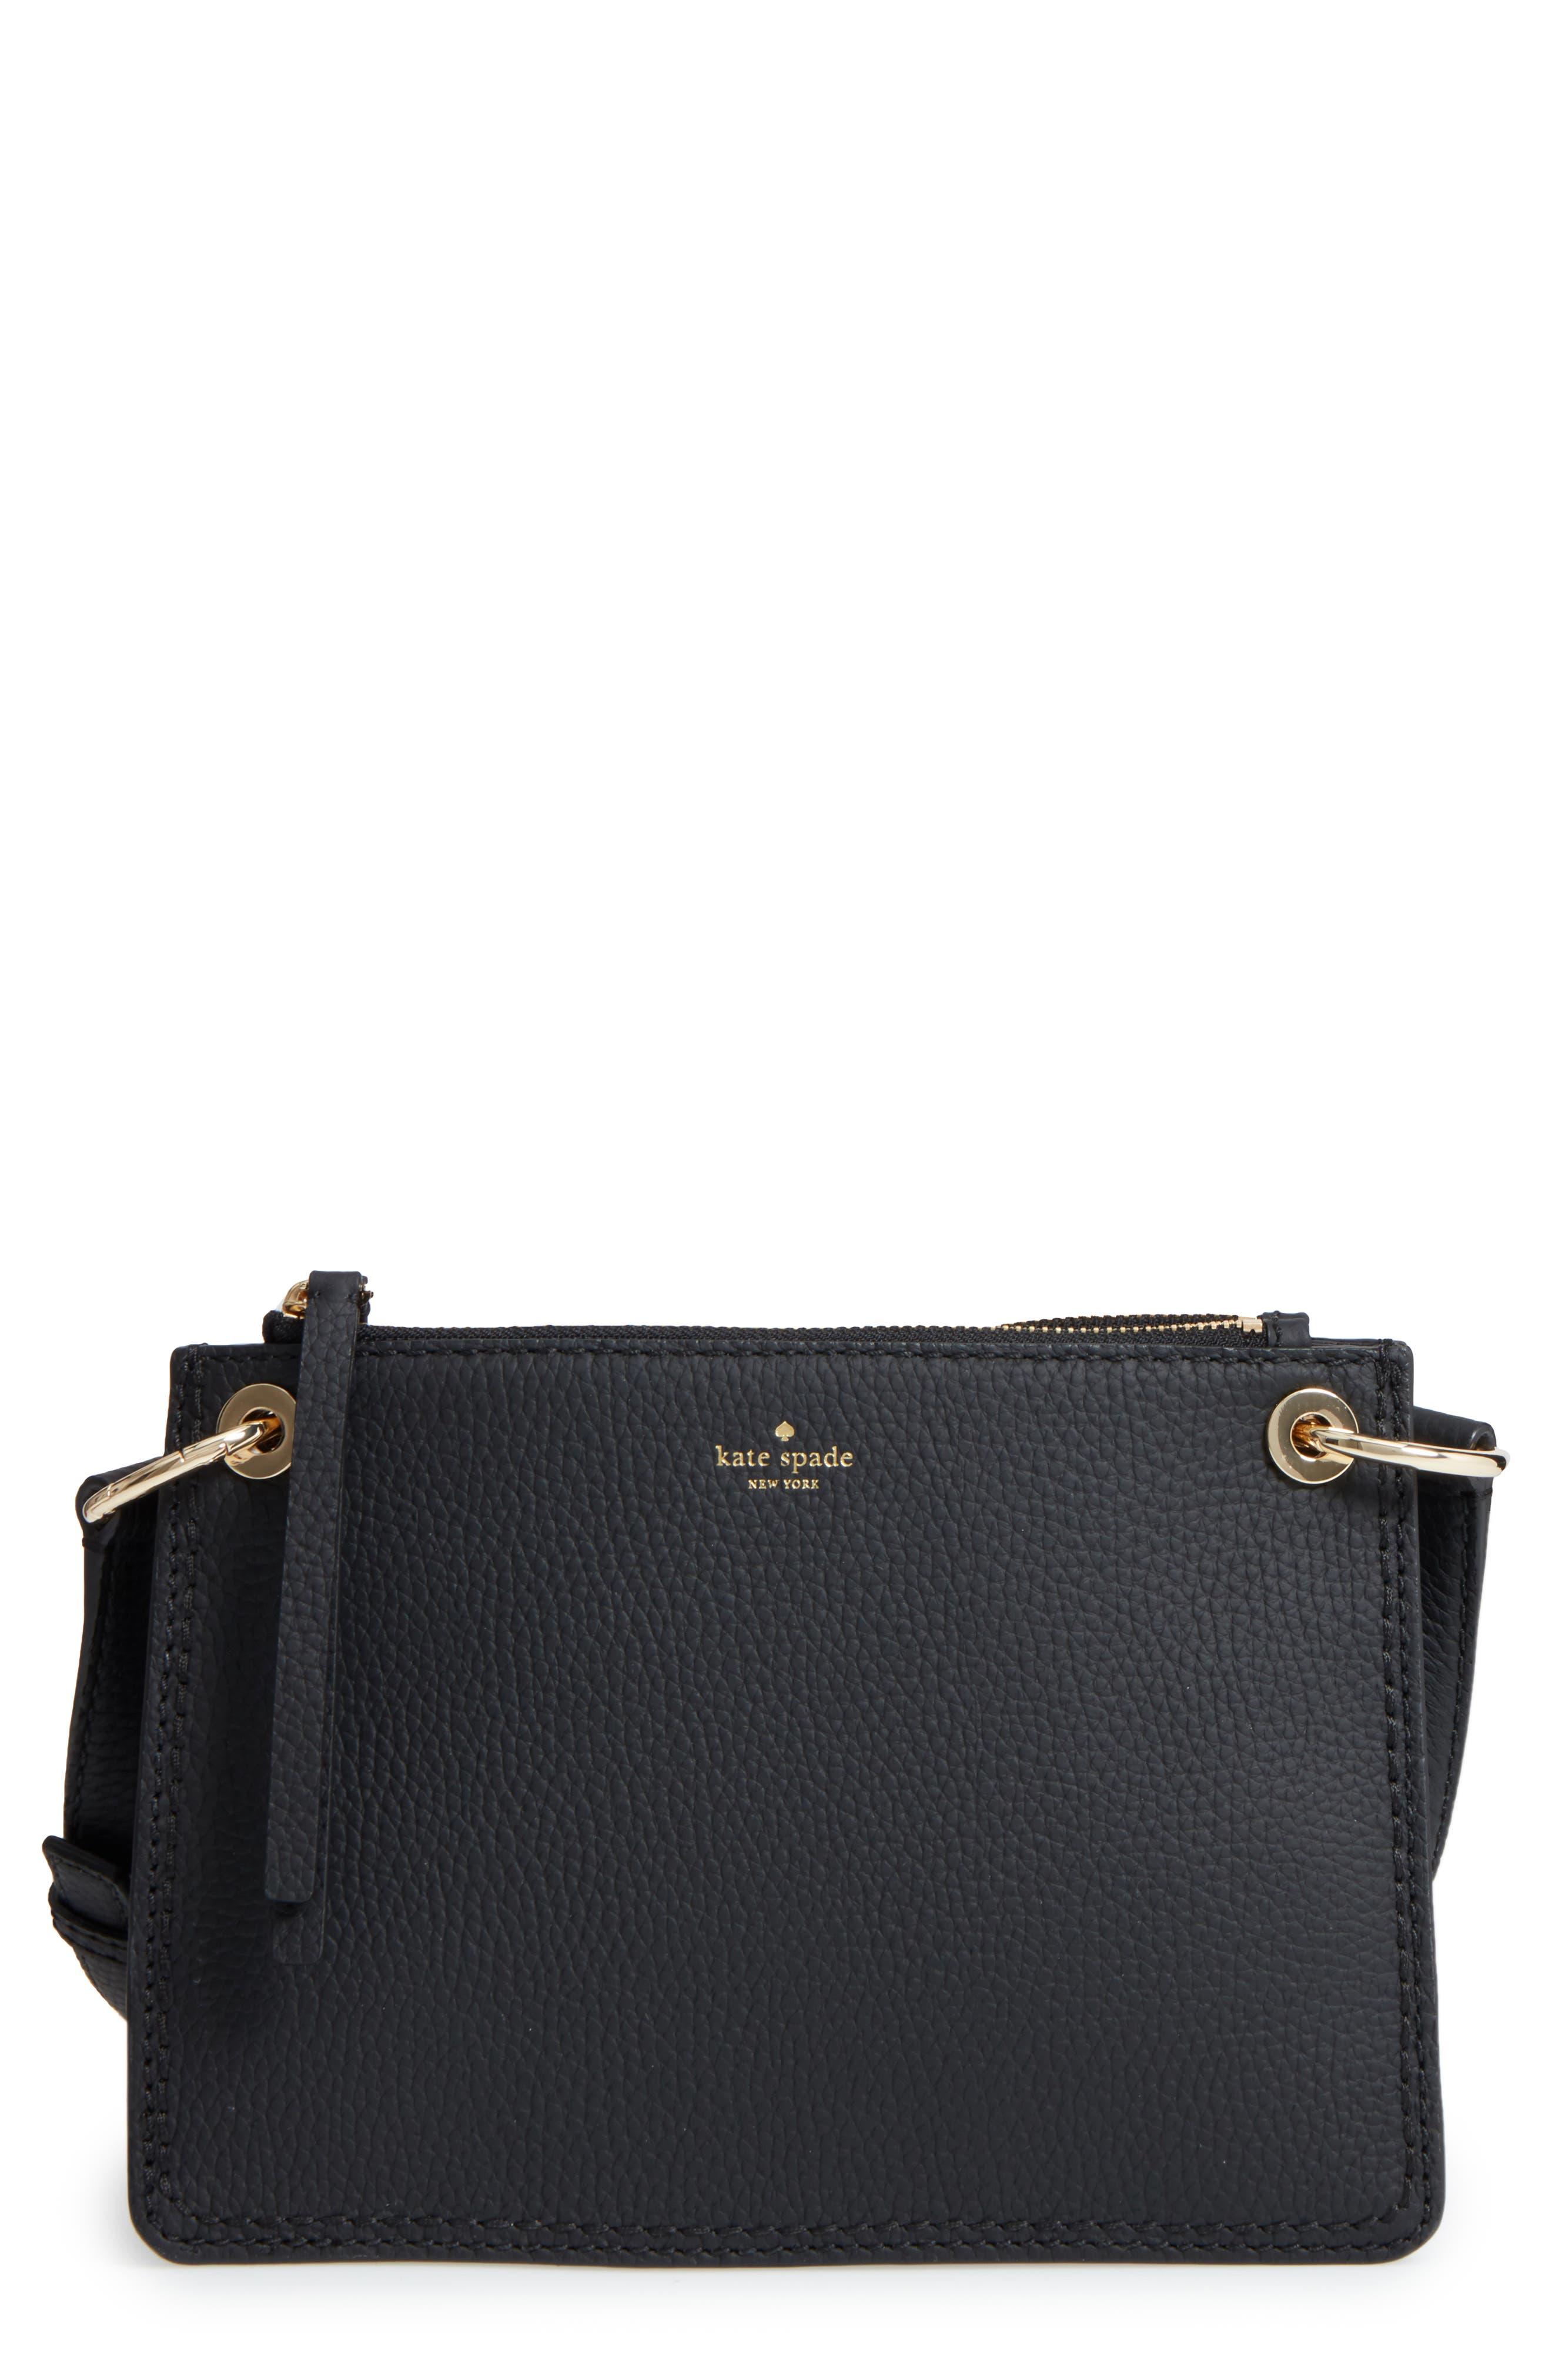 KATE SPADE NEW YORK dunne lane - caro leather crossbody bag